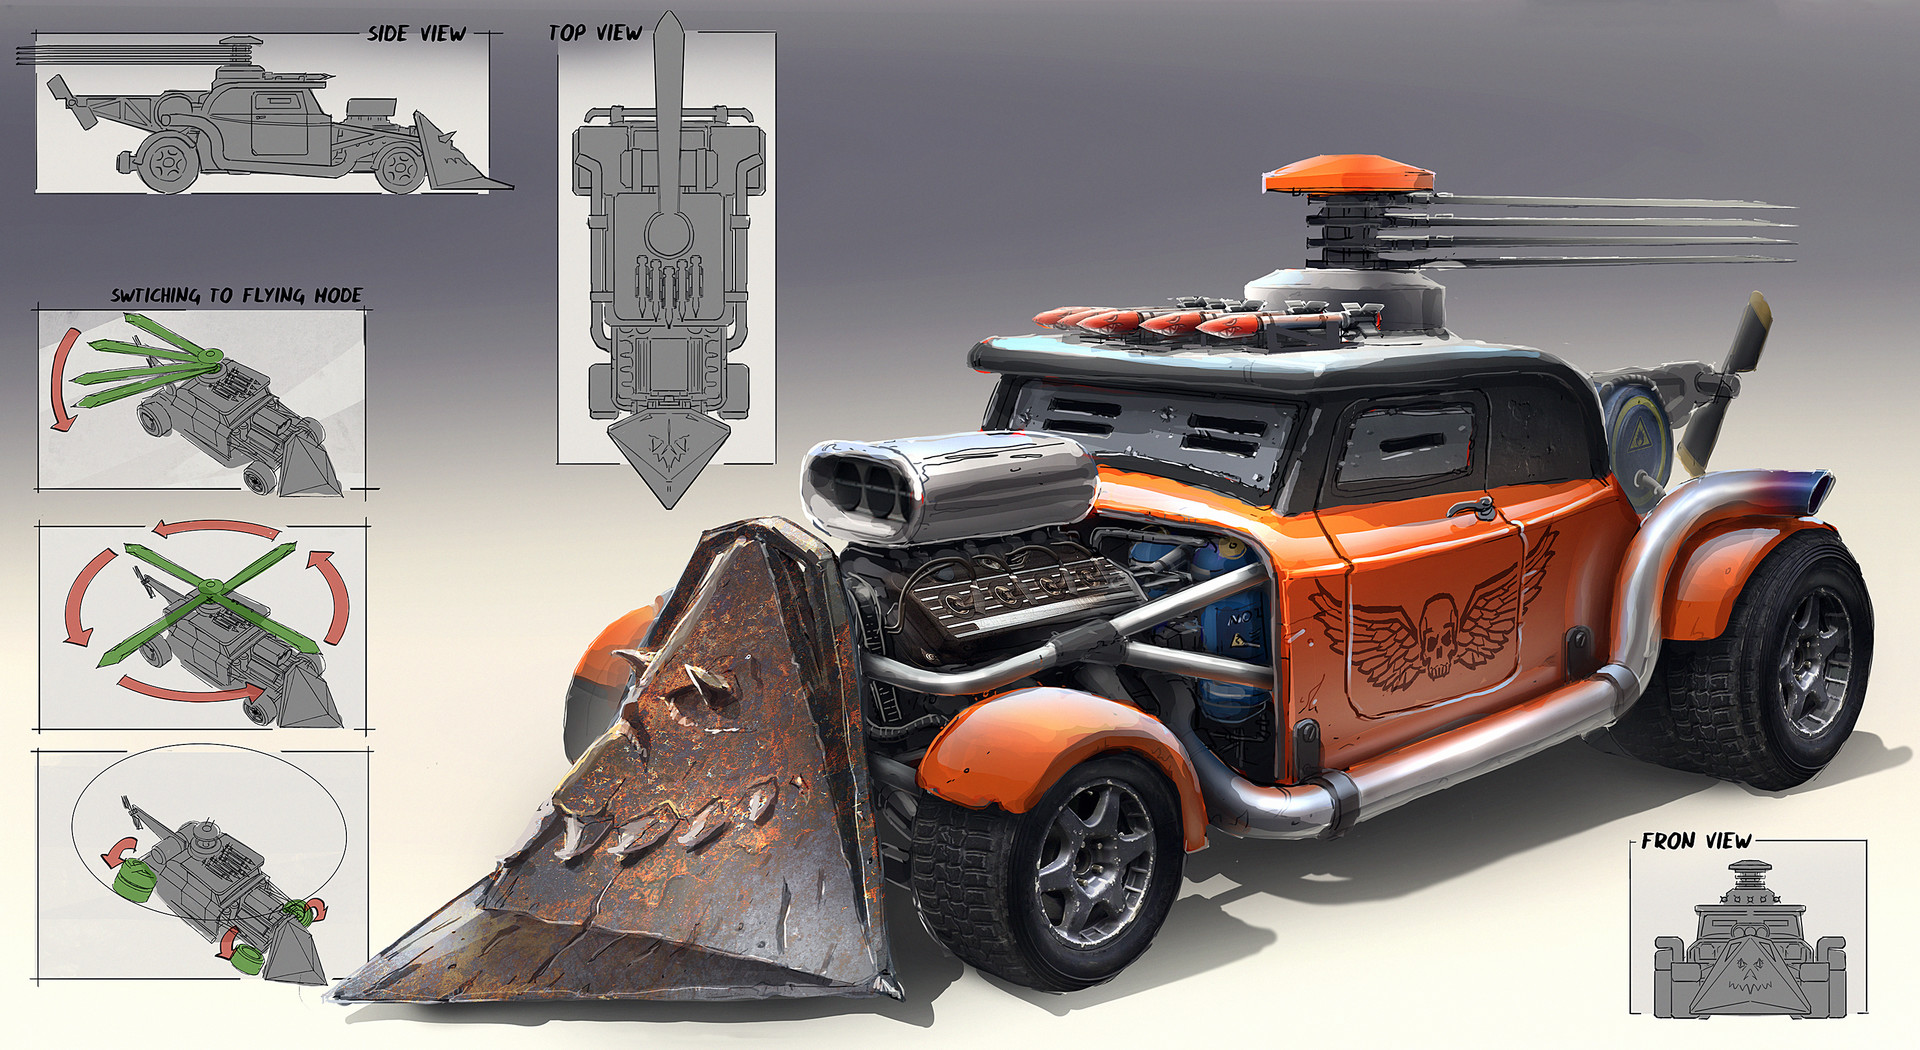 Martynas latusinskas vehicle design 1 martynas latusinskas